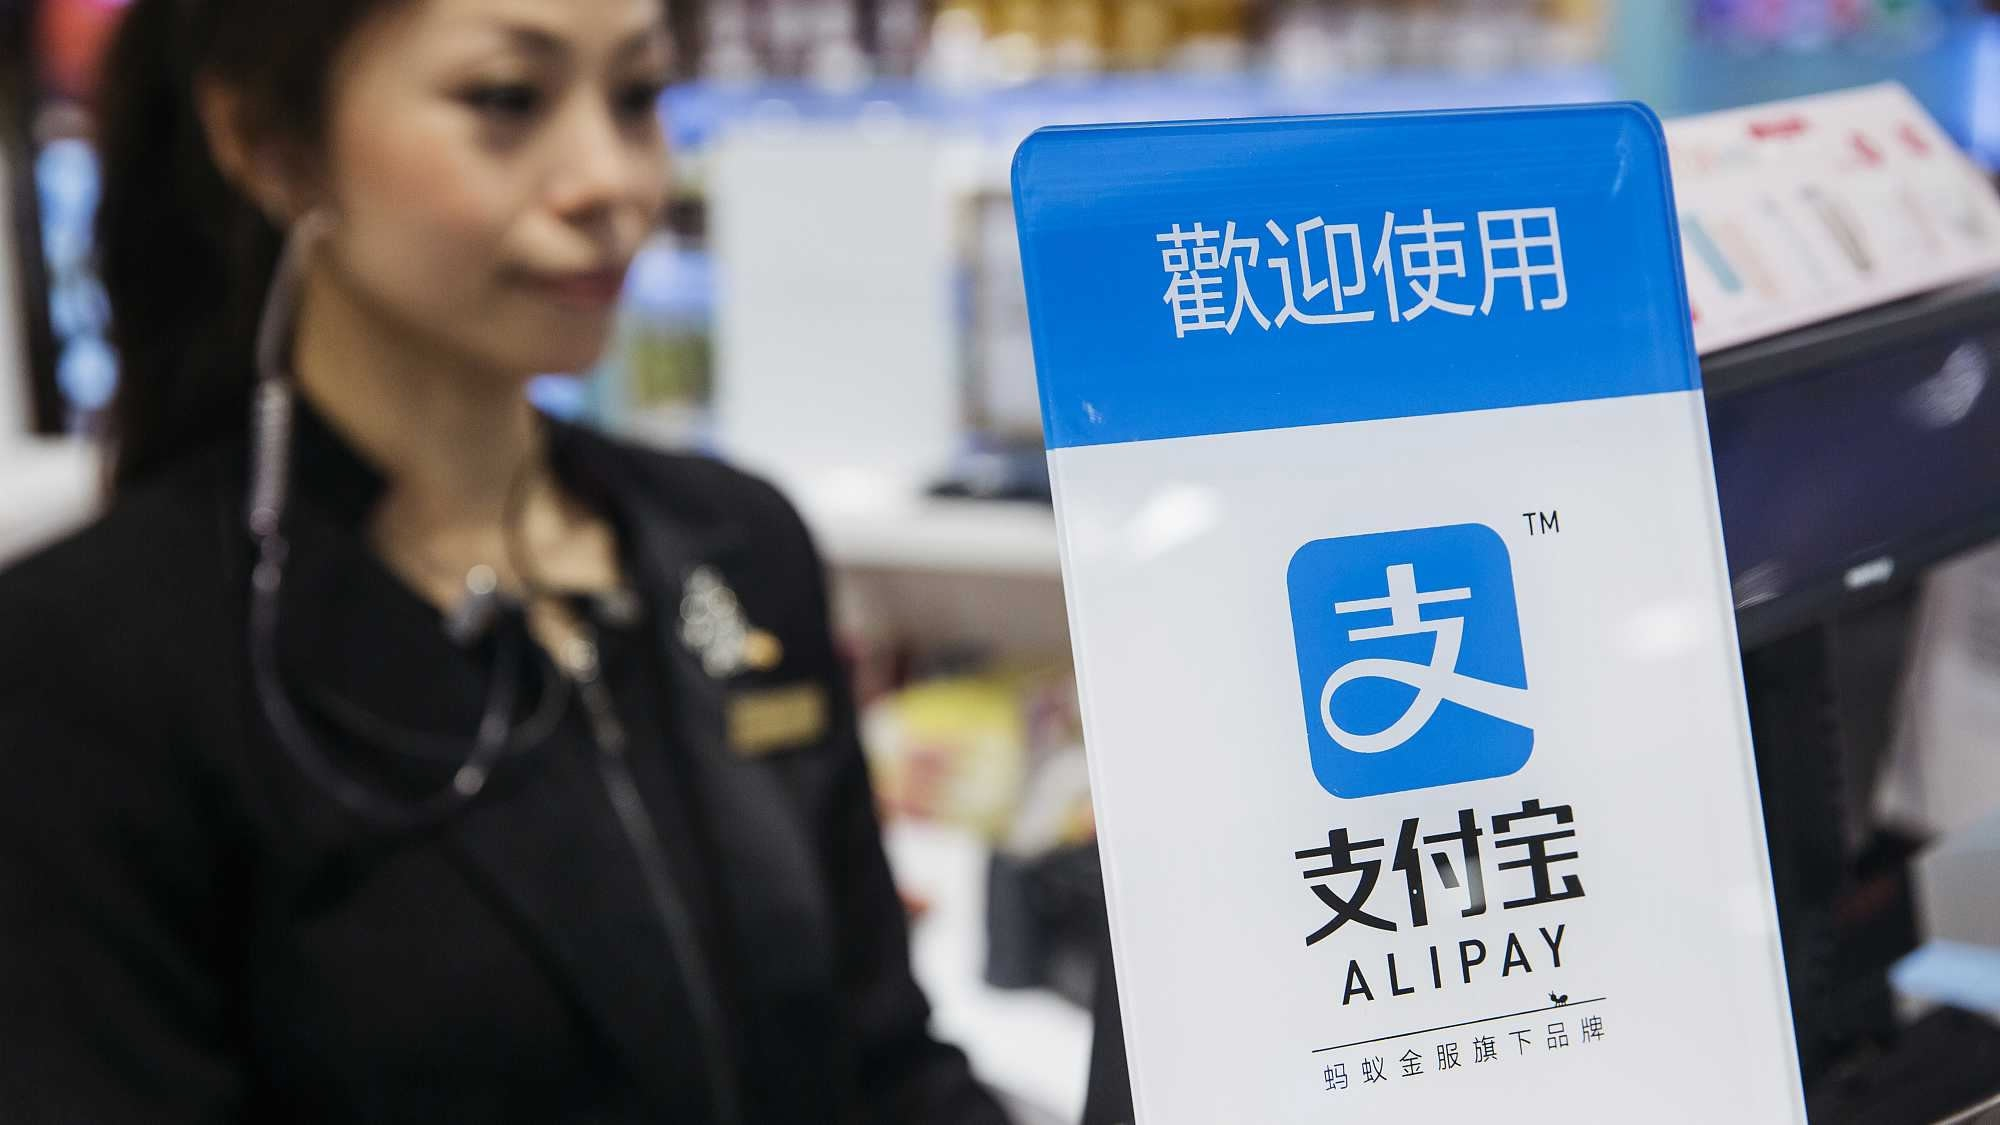 Washington's abusive sanction on foreign firms self-sabotage